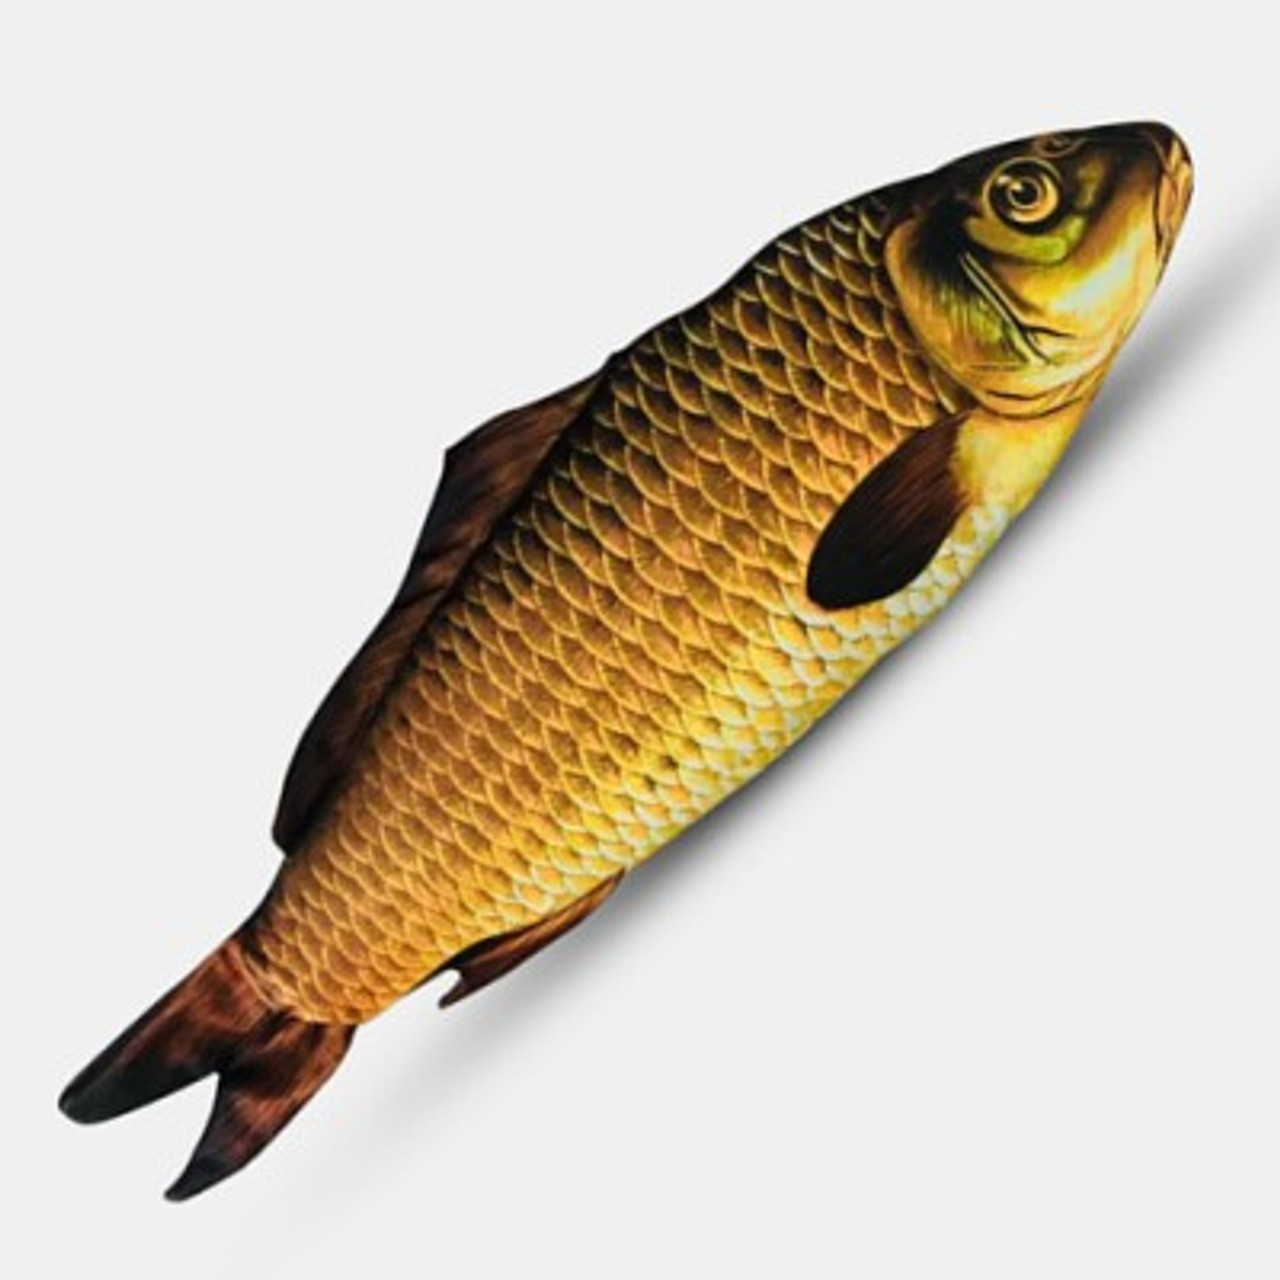 Instant Appearing Fish Magic Trick Gospel